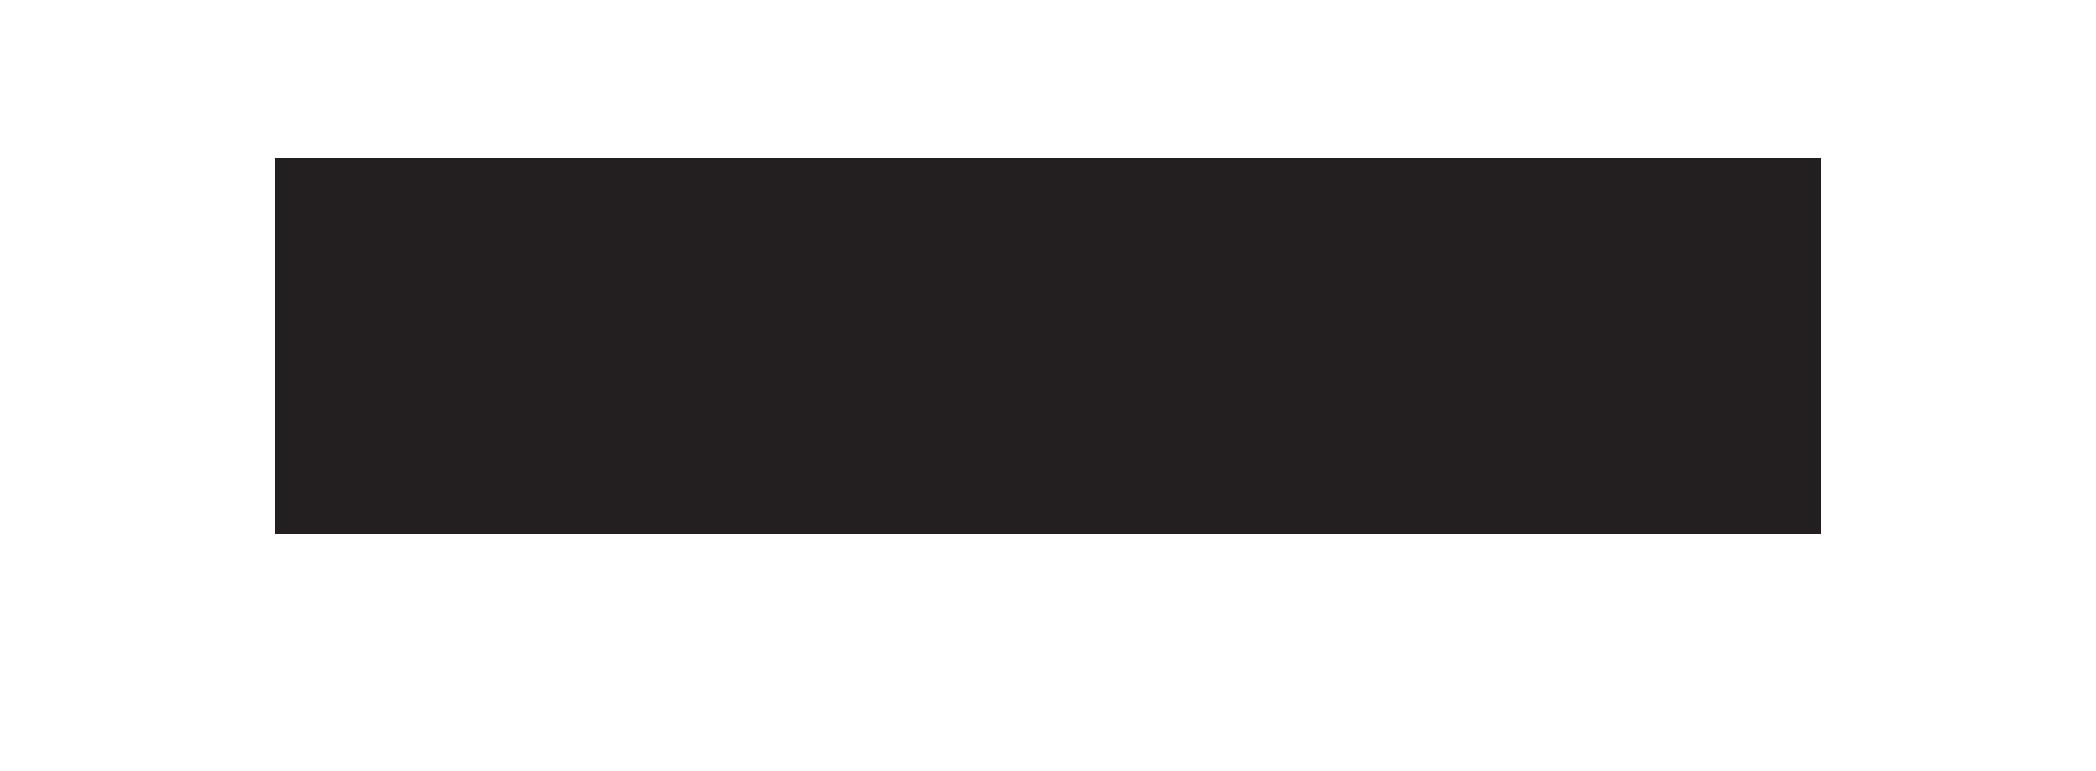 kisspng-mikrotik-routeros-hewlett-packard-ubiquiti-network-hack-5b30390520a925.3479493115298869811338